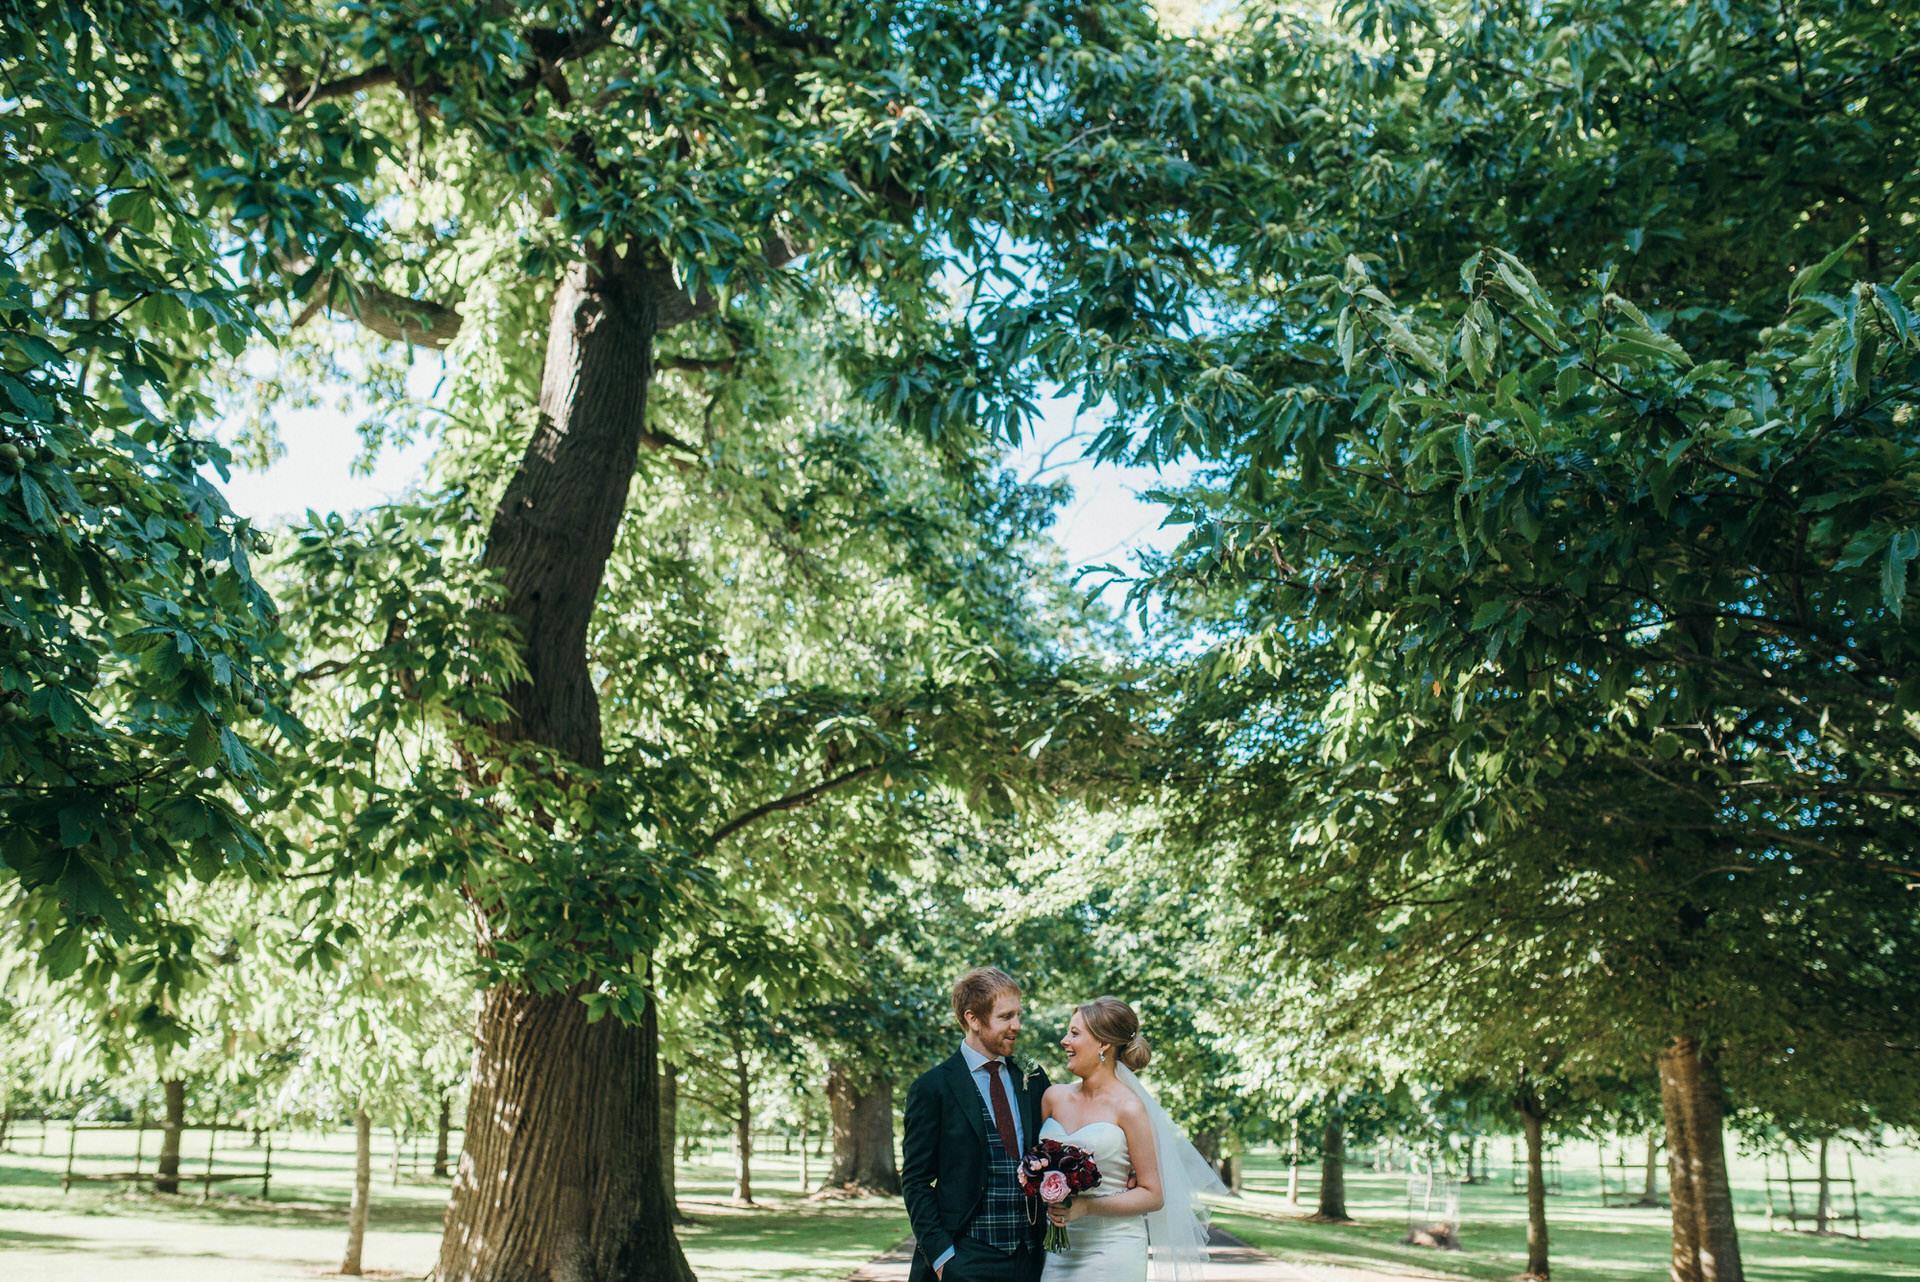 Maunsel house wedding photography 30 wedding portrait